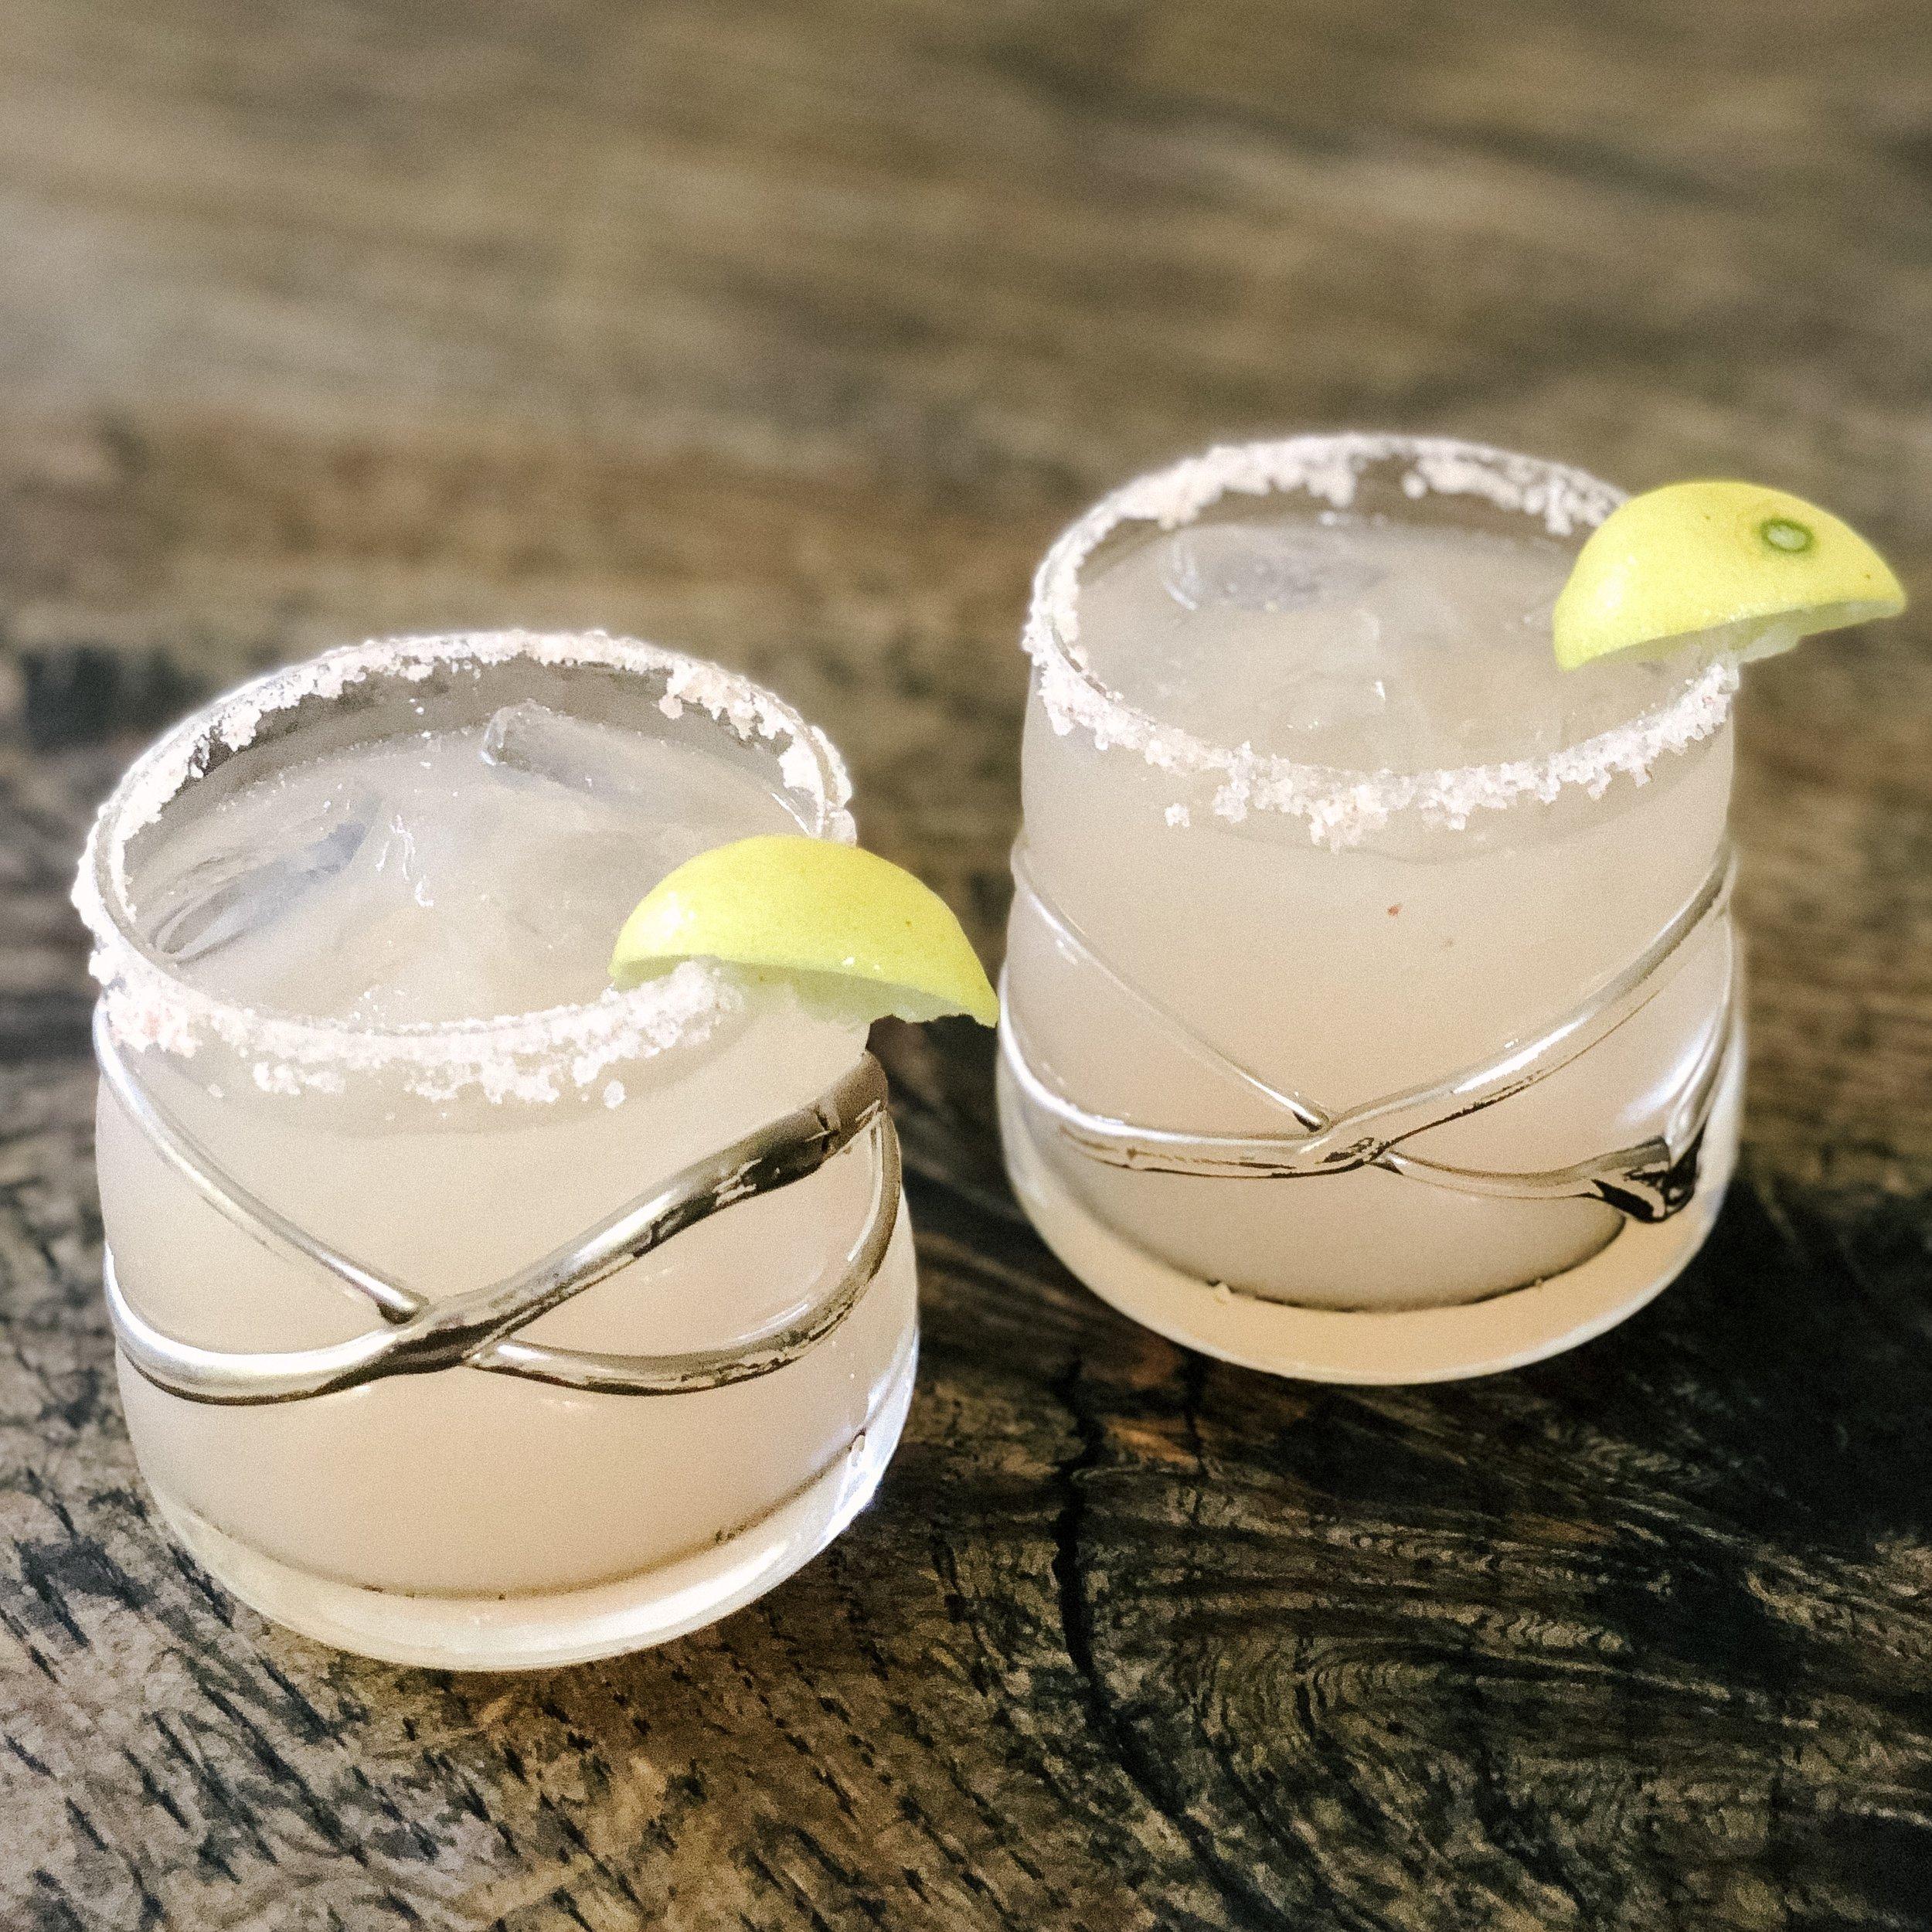 Healthy Margarita! - * Salt rim with Himalayan pink salt* 1 shot of tequila* 1 part Simply Limeade juice* 1 part Simply Grapefruit juice* Fresh lime